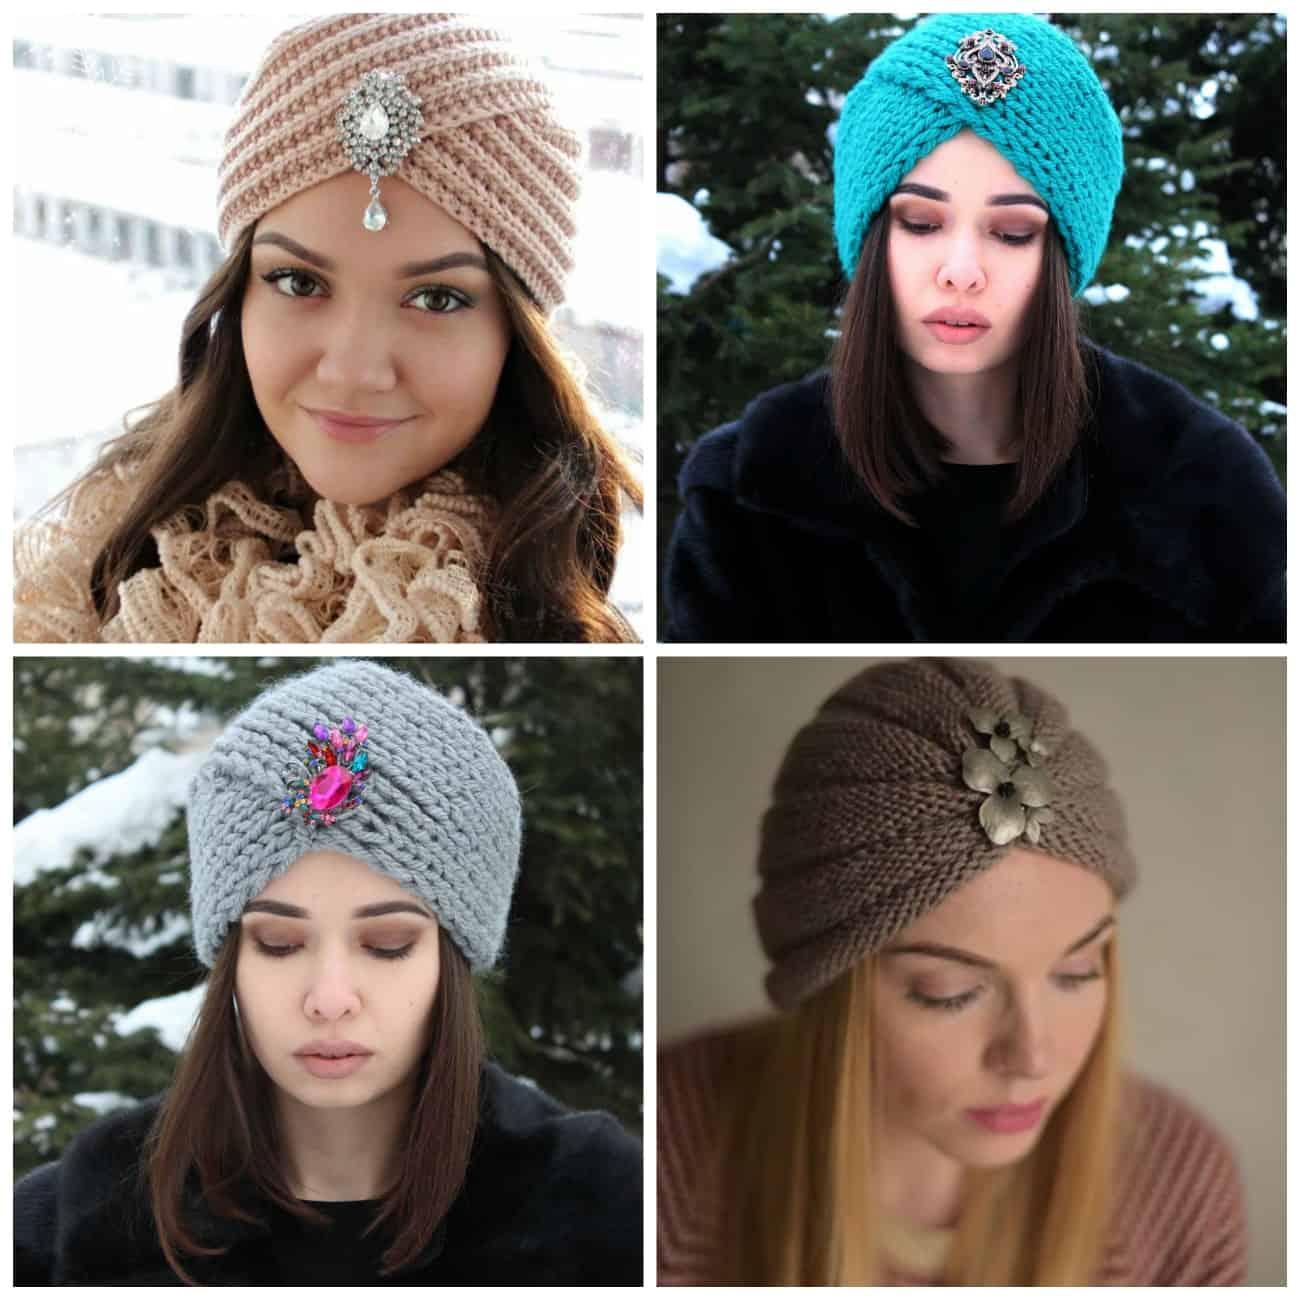 купить шапку чалму тренд сезона